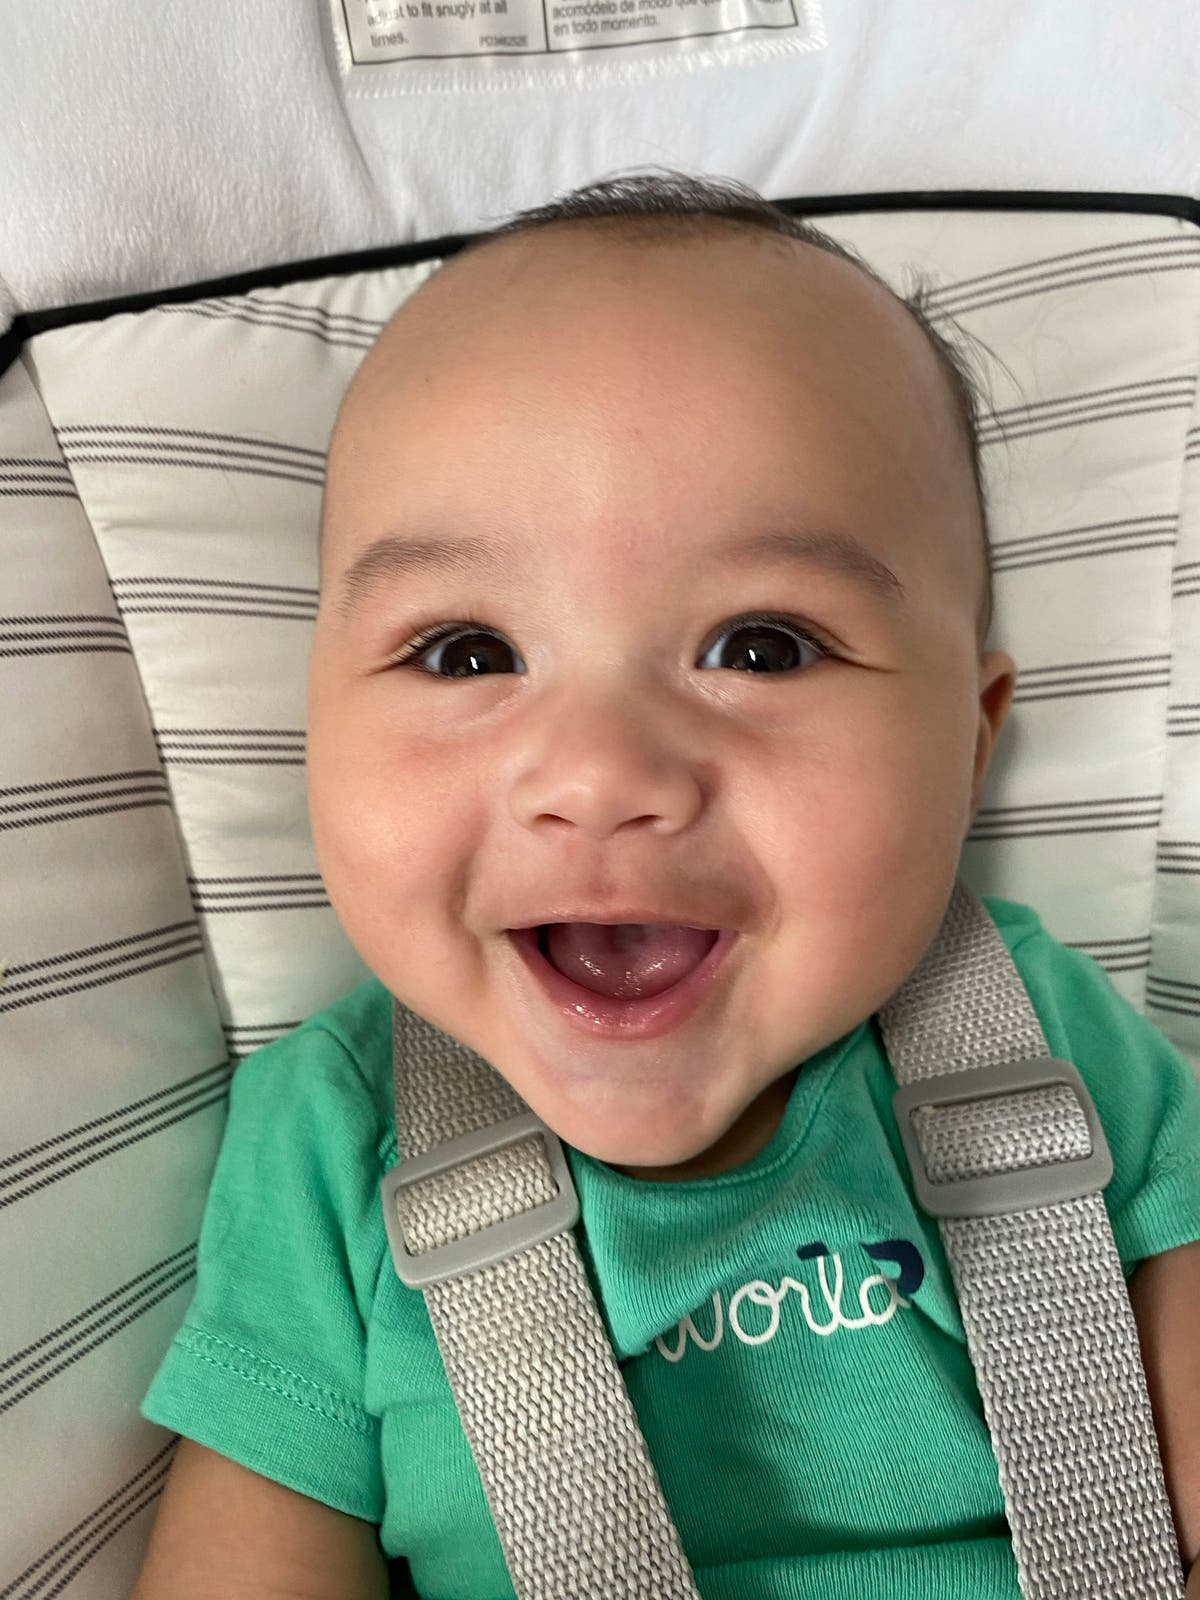 Florida baby picked as Gerber spokesbaby;' wins $25,000